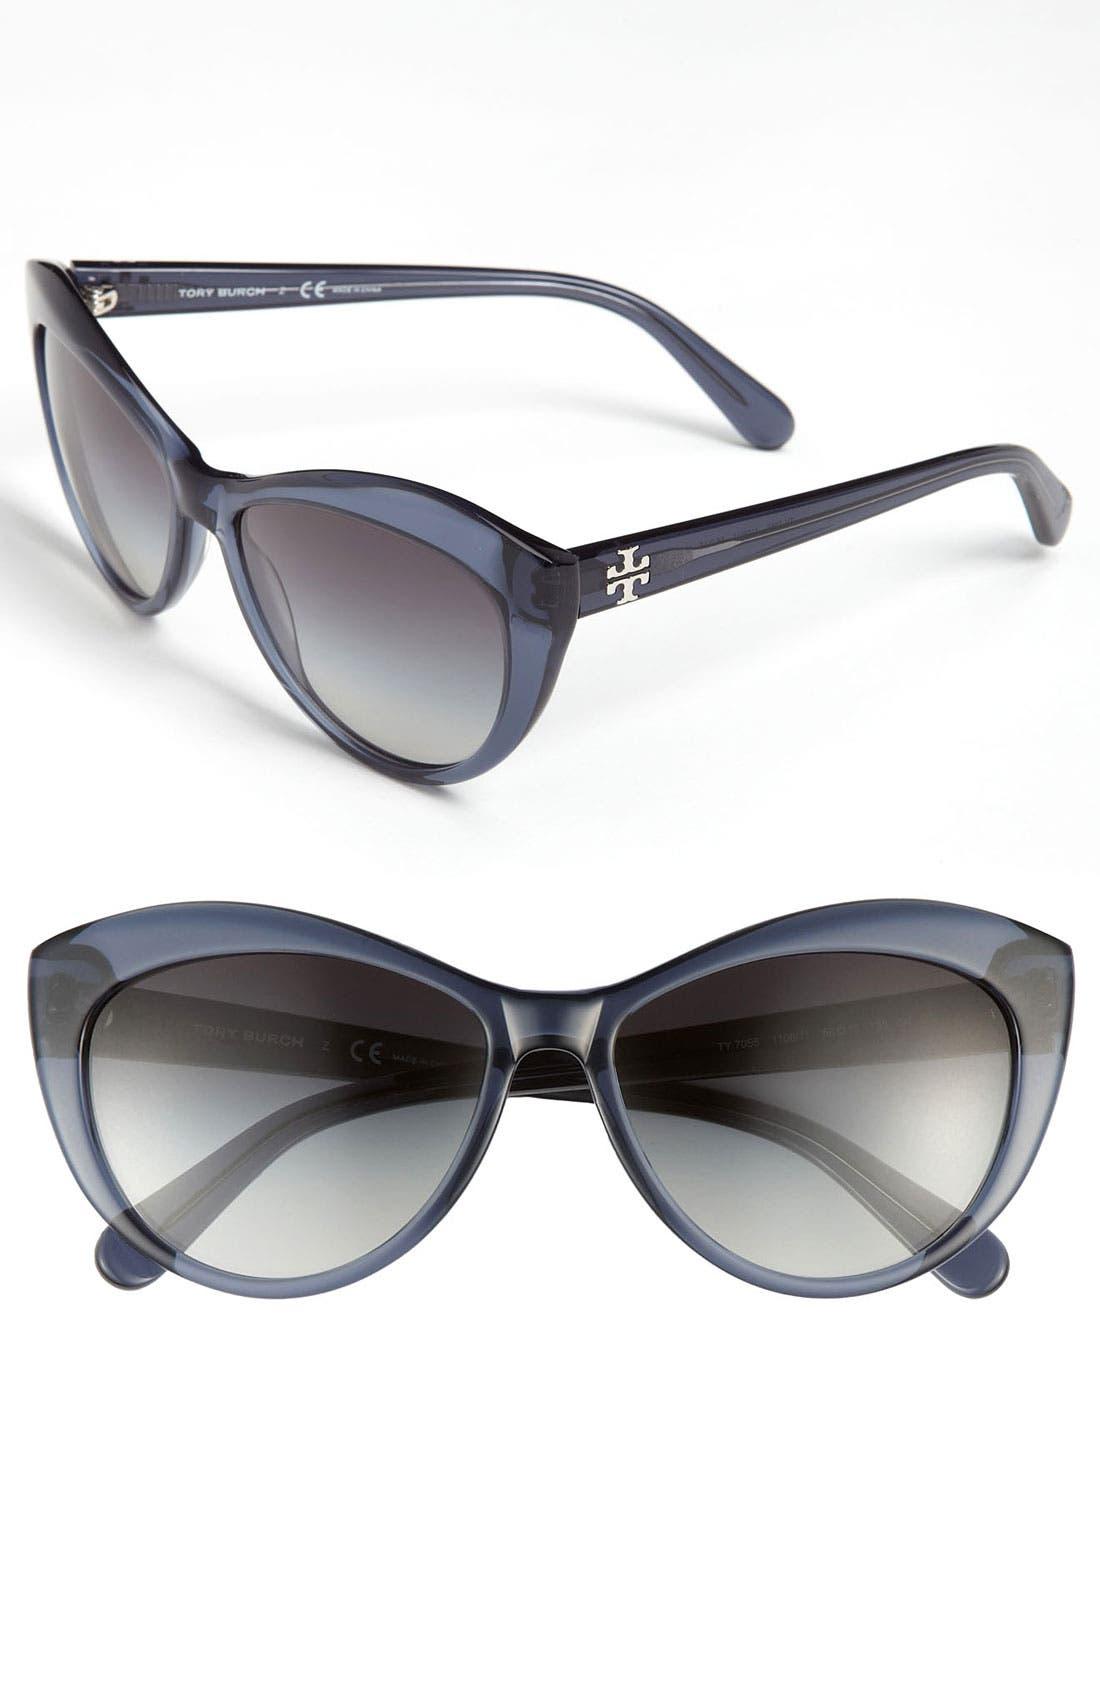 Main Image - Tory Burch 56mm Cat Eye Sunglasses